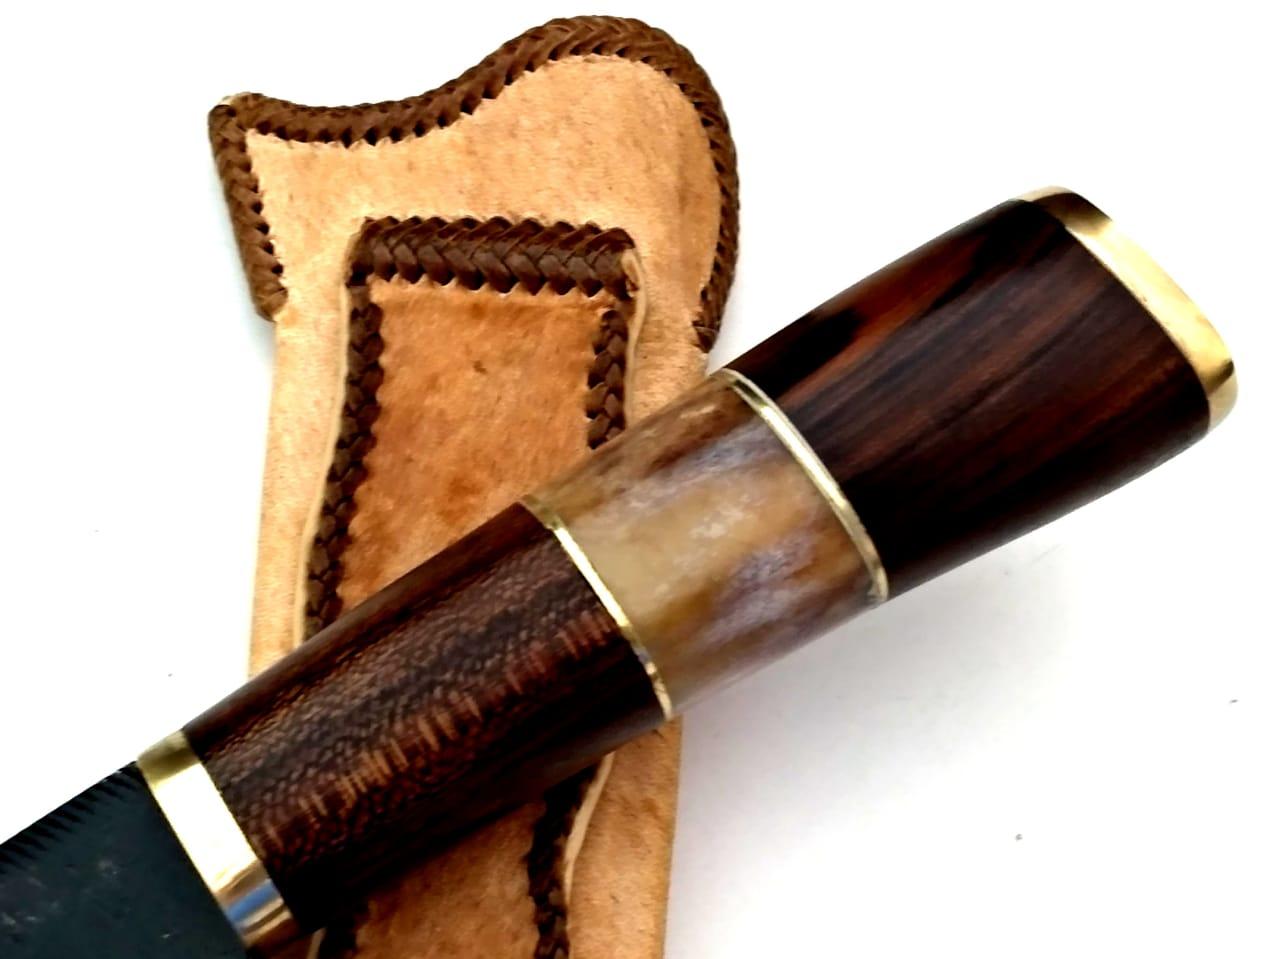 Faca artesanal forjada de lima antiga 8 polegadas